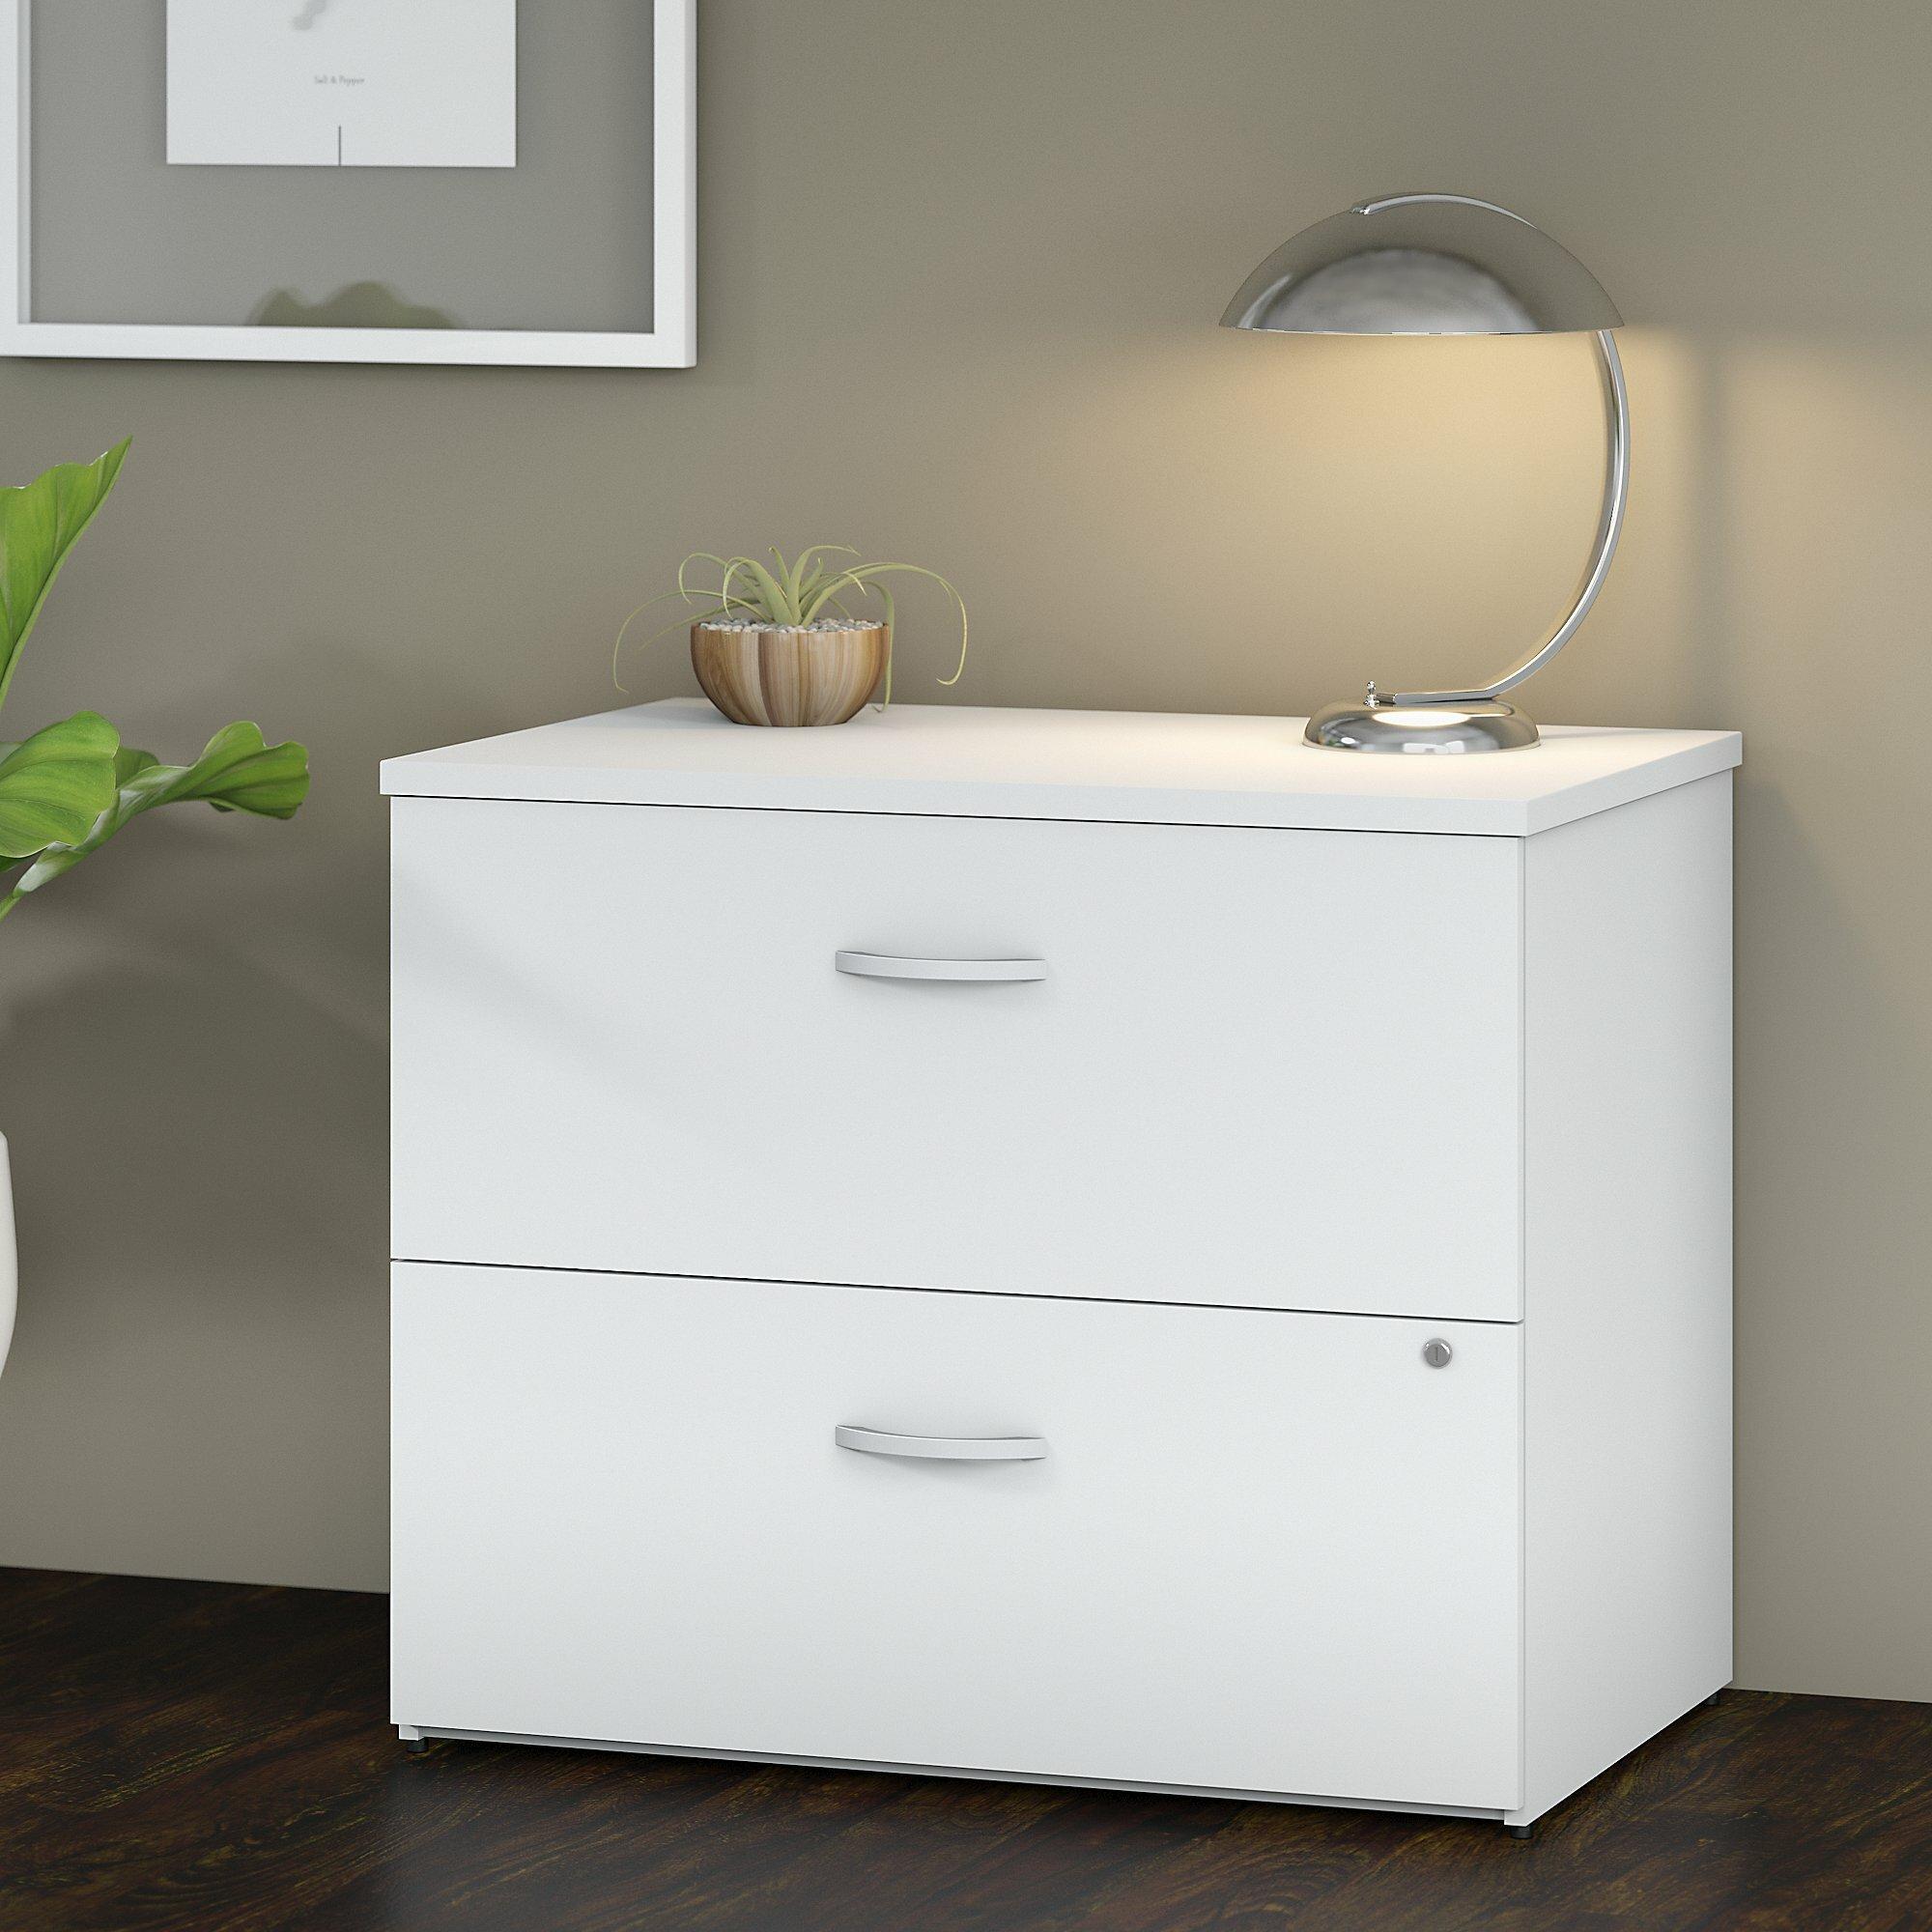 2 drawer lateral file cabinet. Bush Business Furniture Studio C 2-Drawer Lateral Filing Cabinet \u0026 Reviews | Wayfair 2 Drawer File